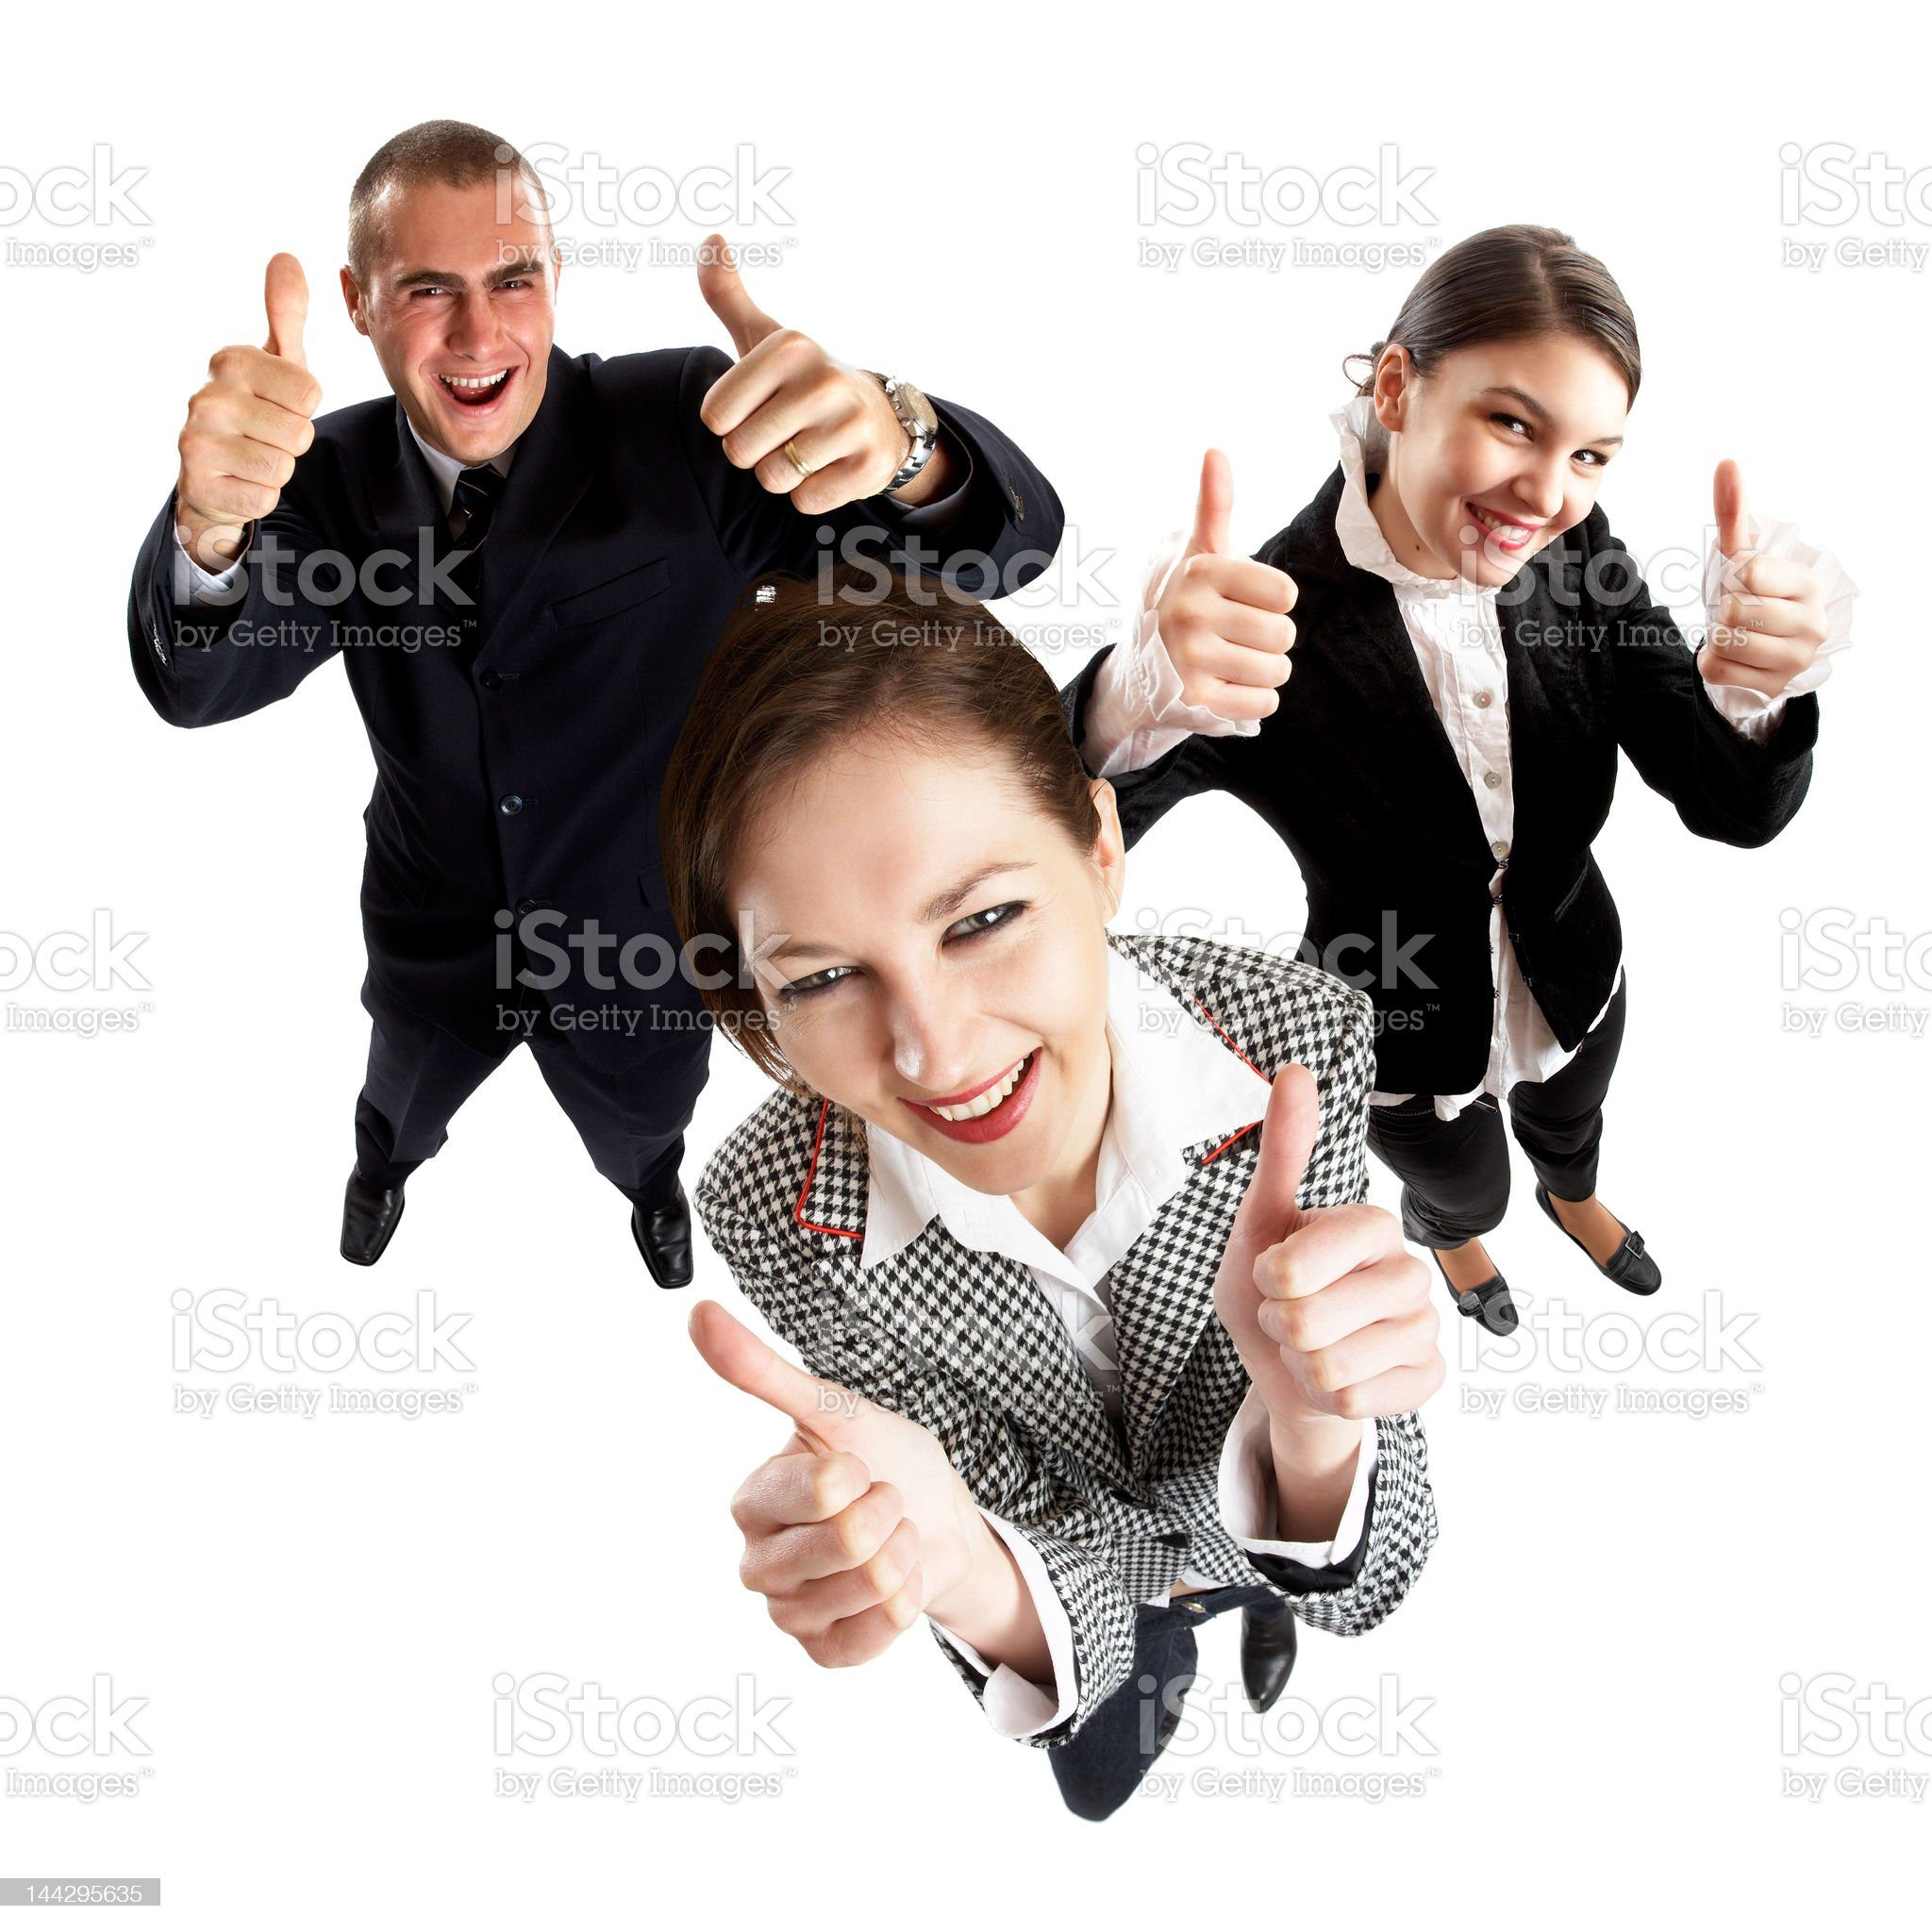 SUCCESS!!! royalty-free stock photo